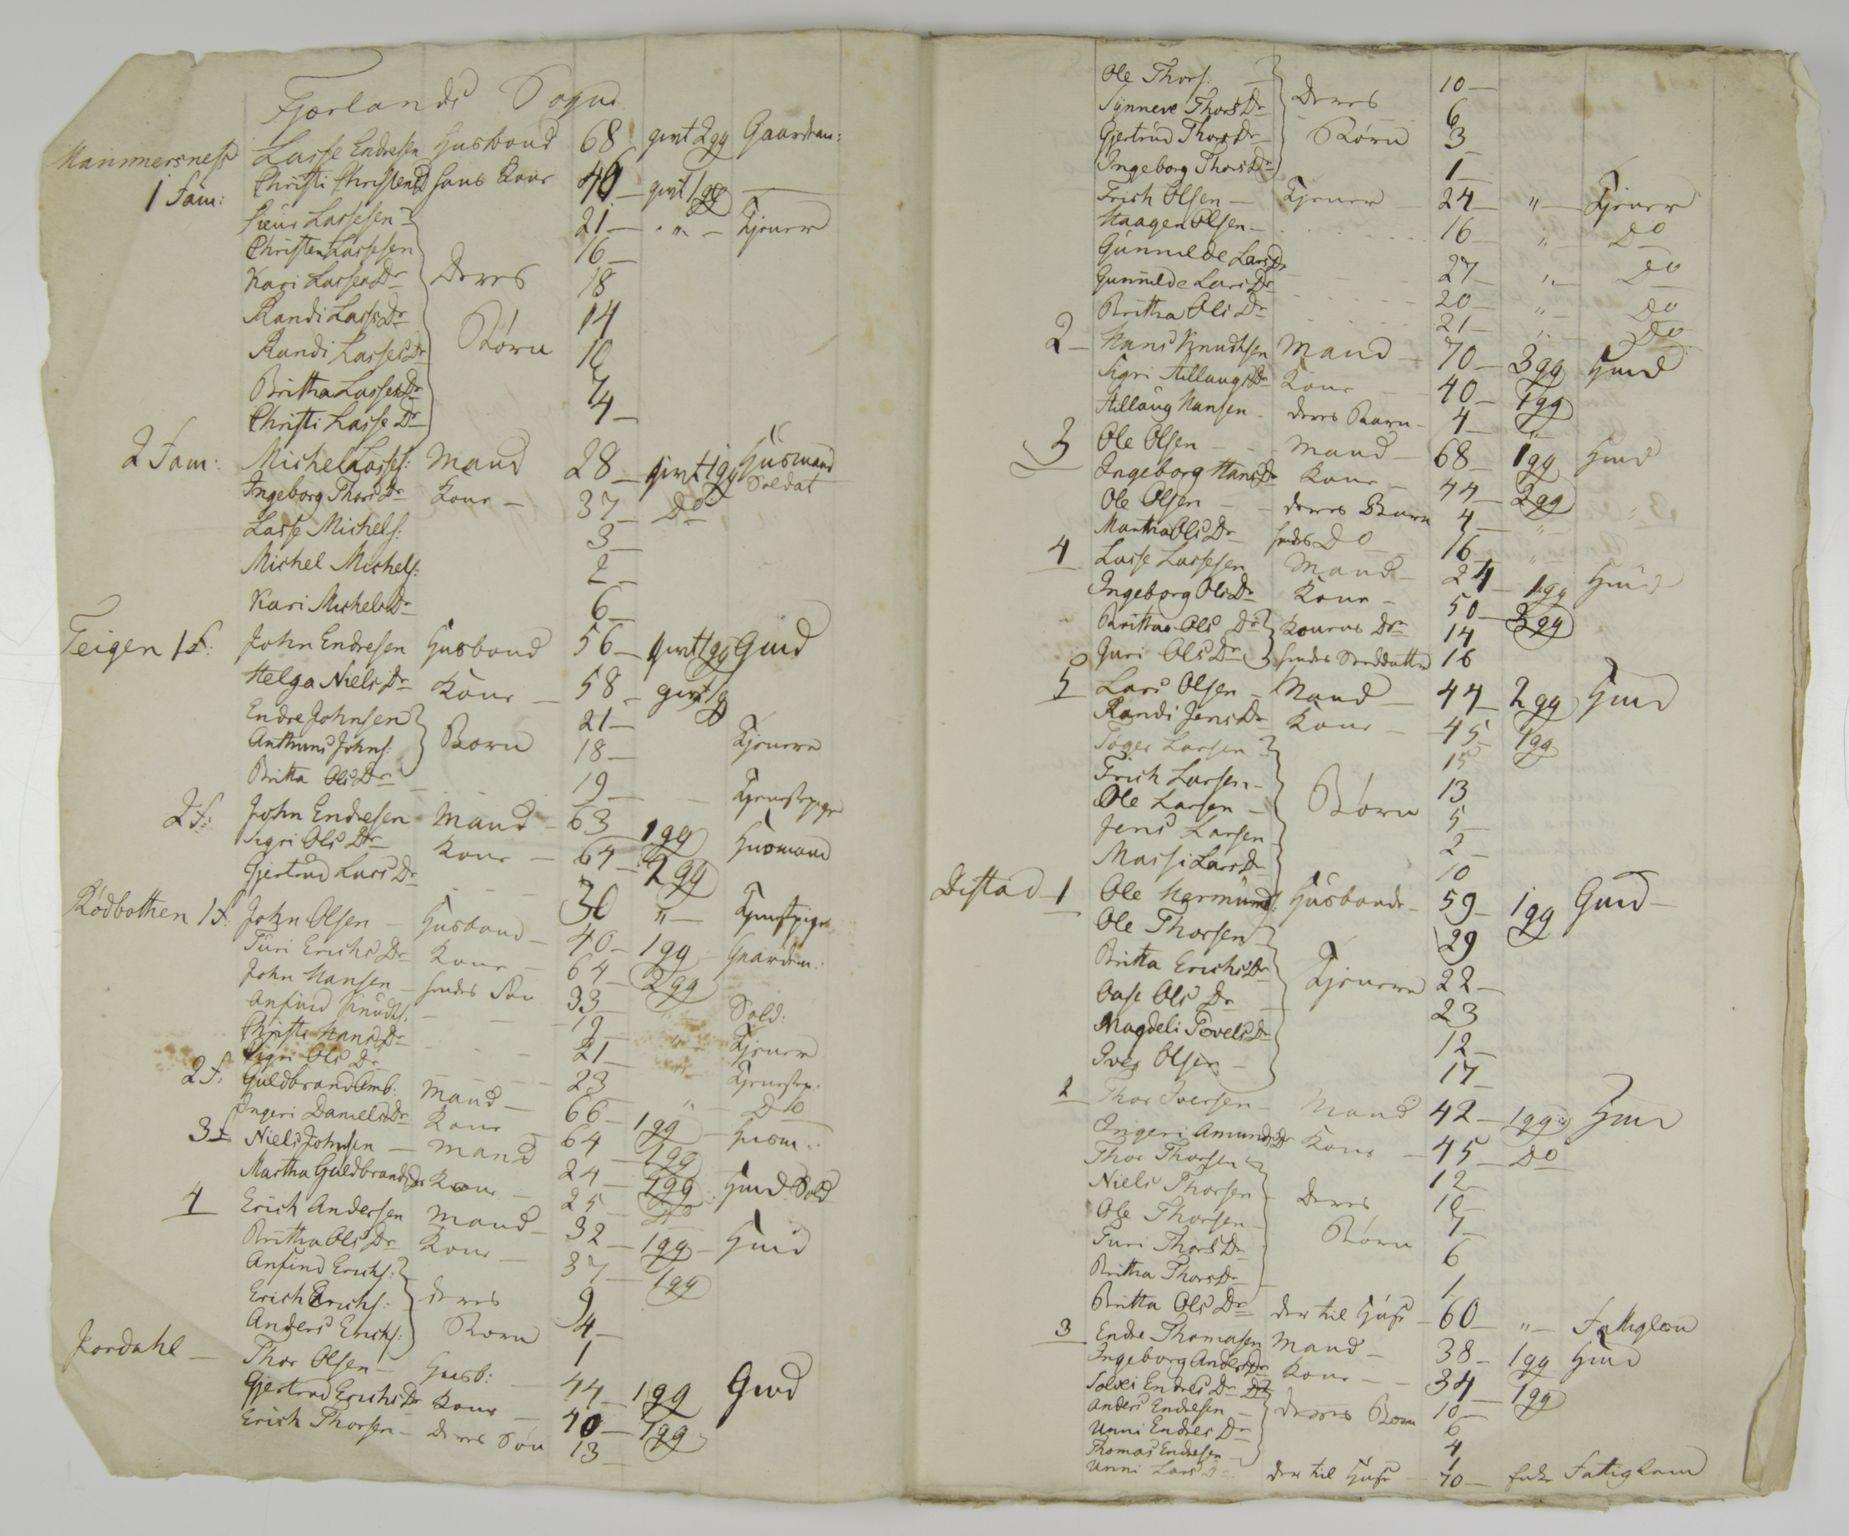 Personliste i folketellingen 1815 for Leikanger (SAB, Leikanger Sokneprestembete).